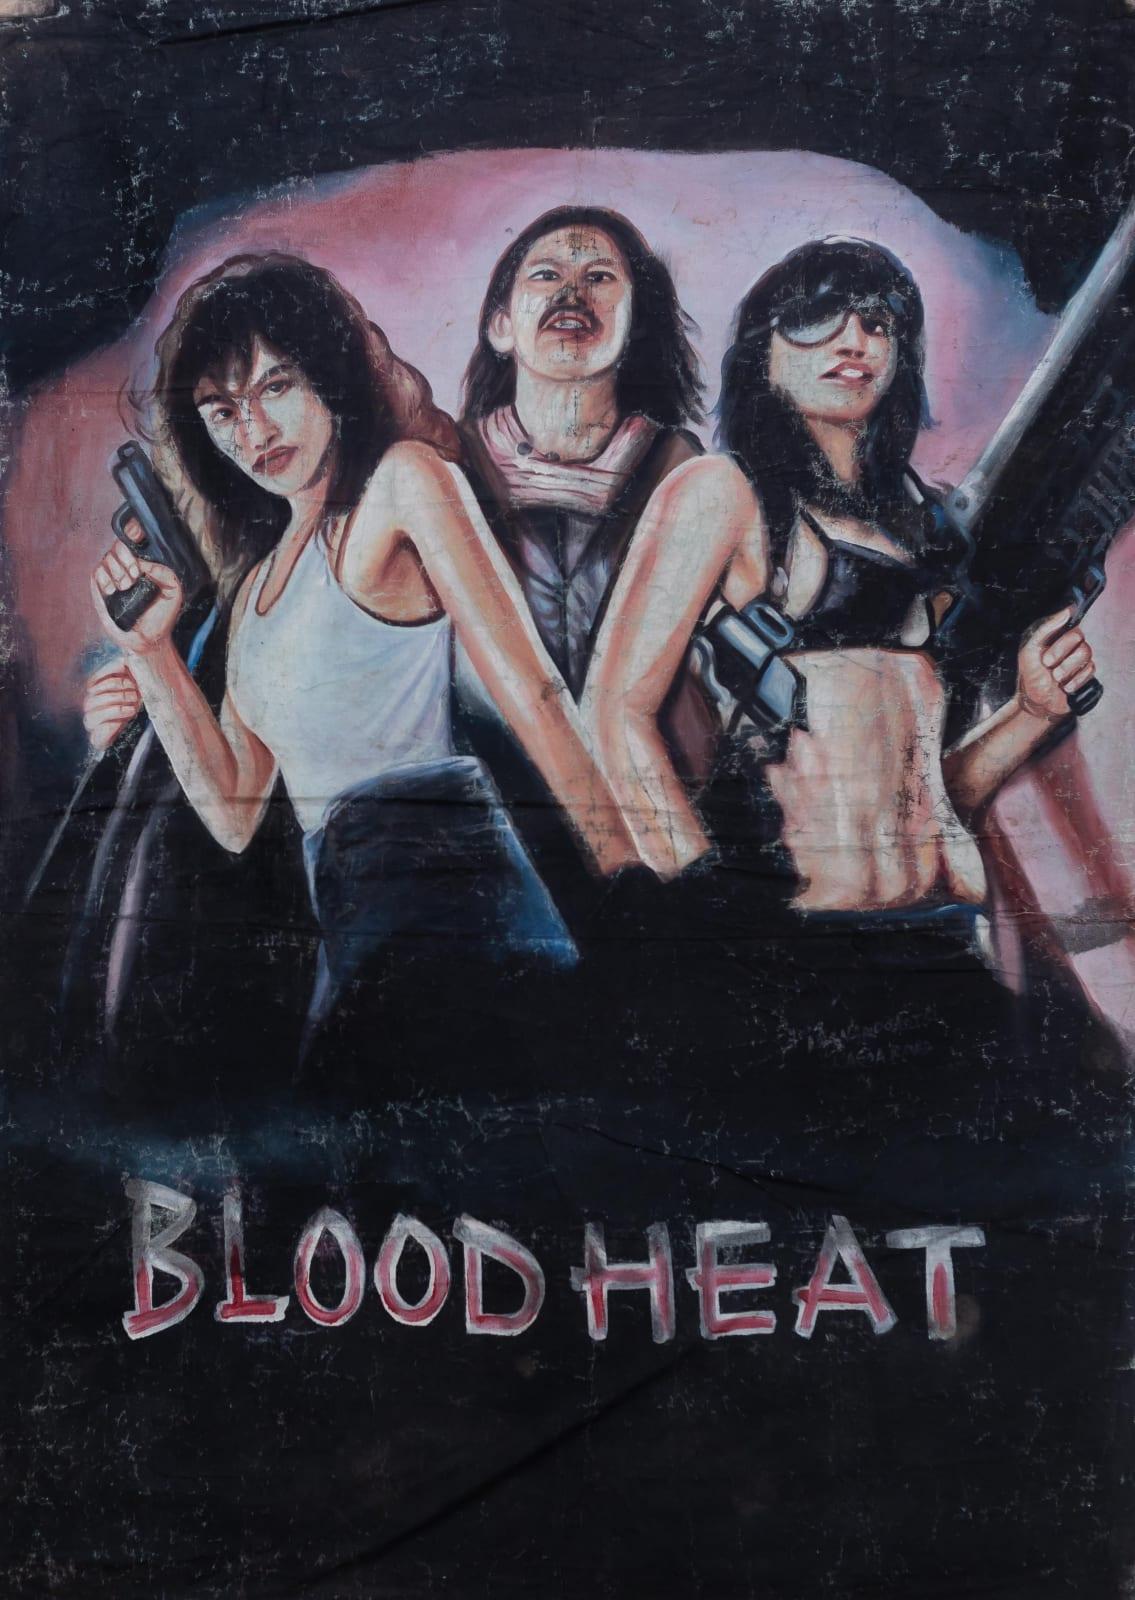 Blood Heat 147 x 104 cm